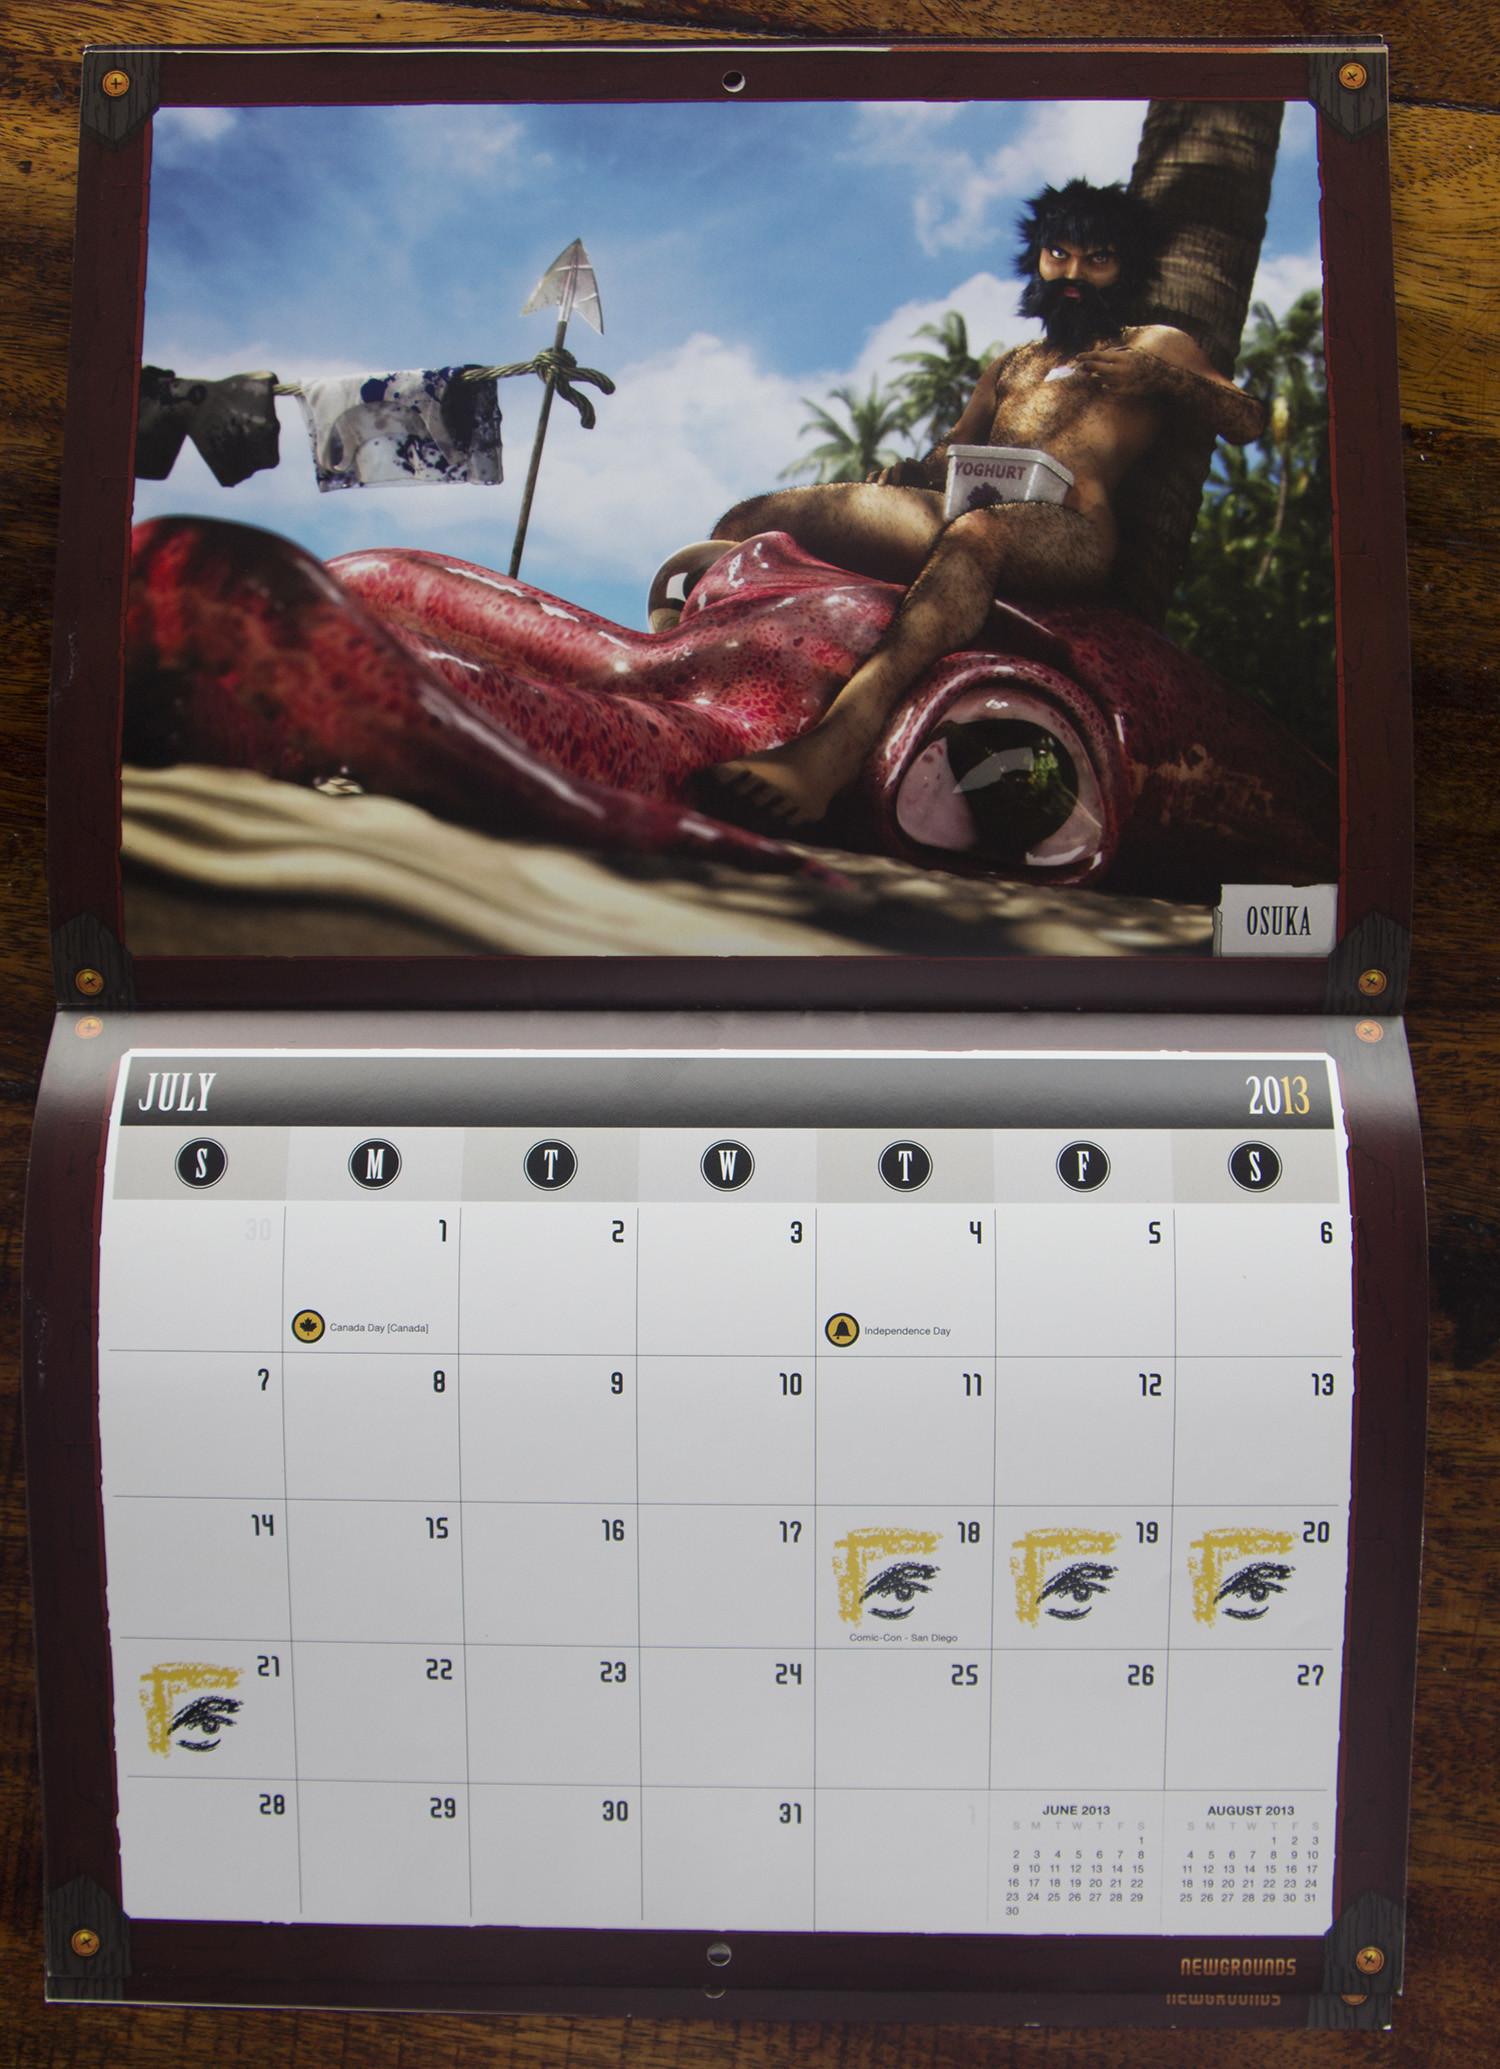 Print of the Calendar